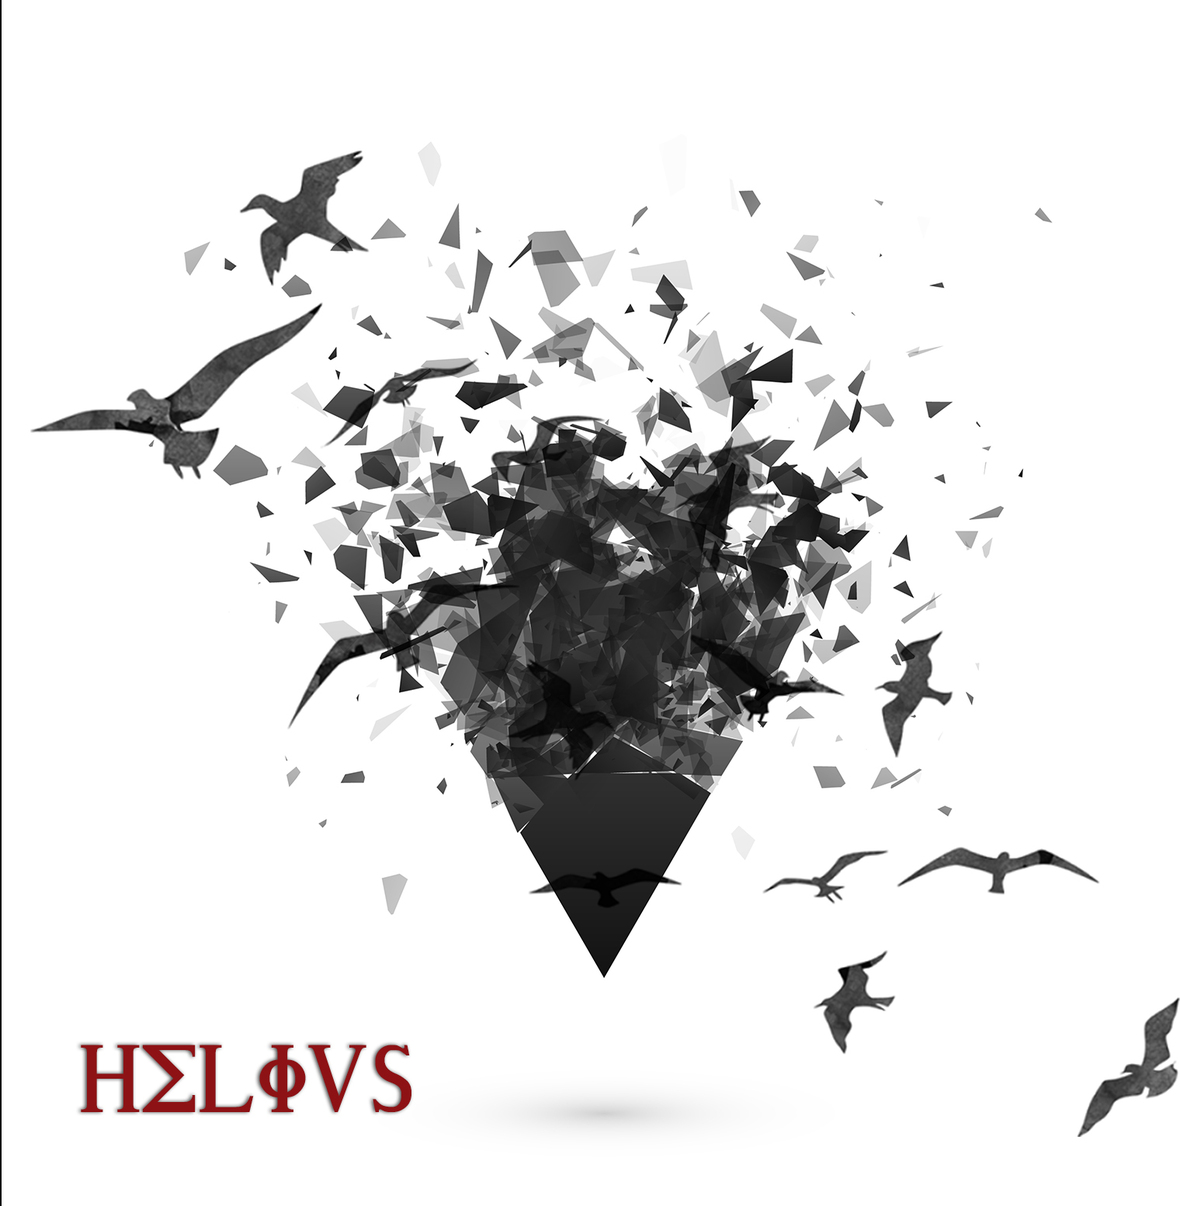 HELIVSalbum